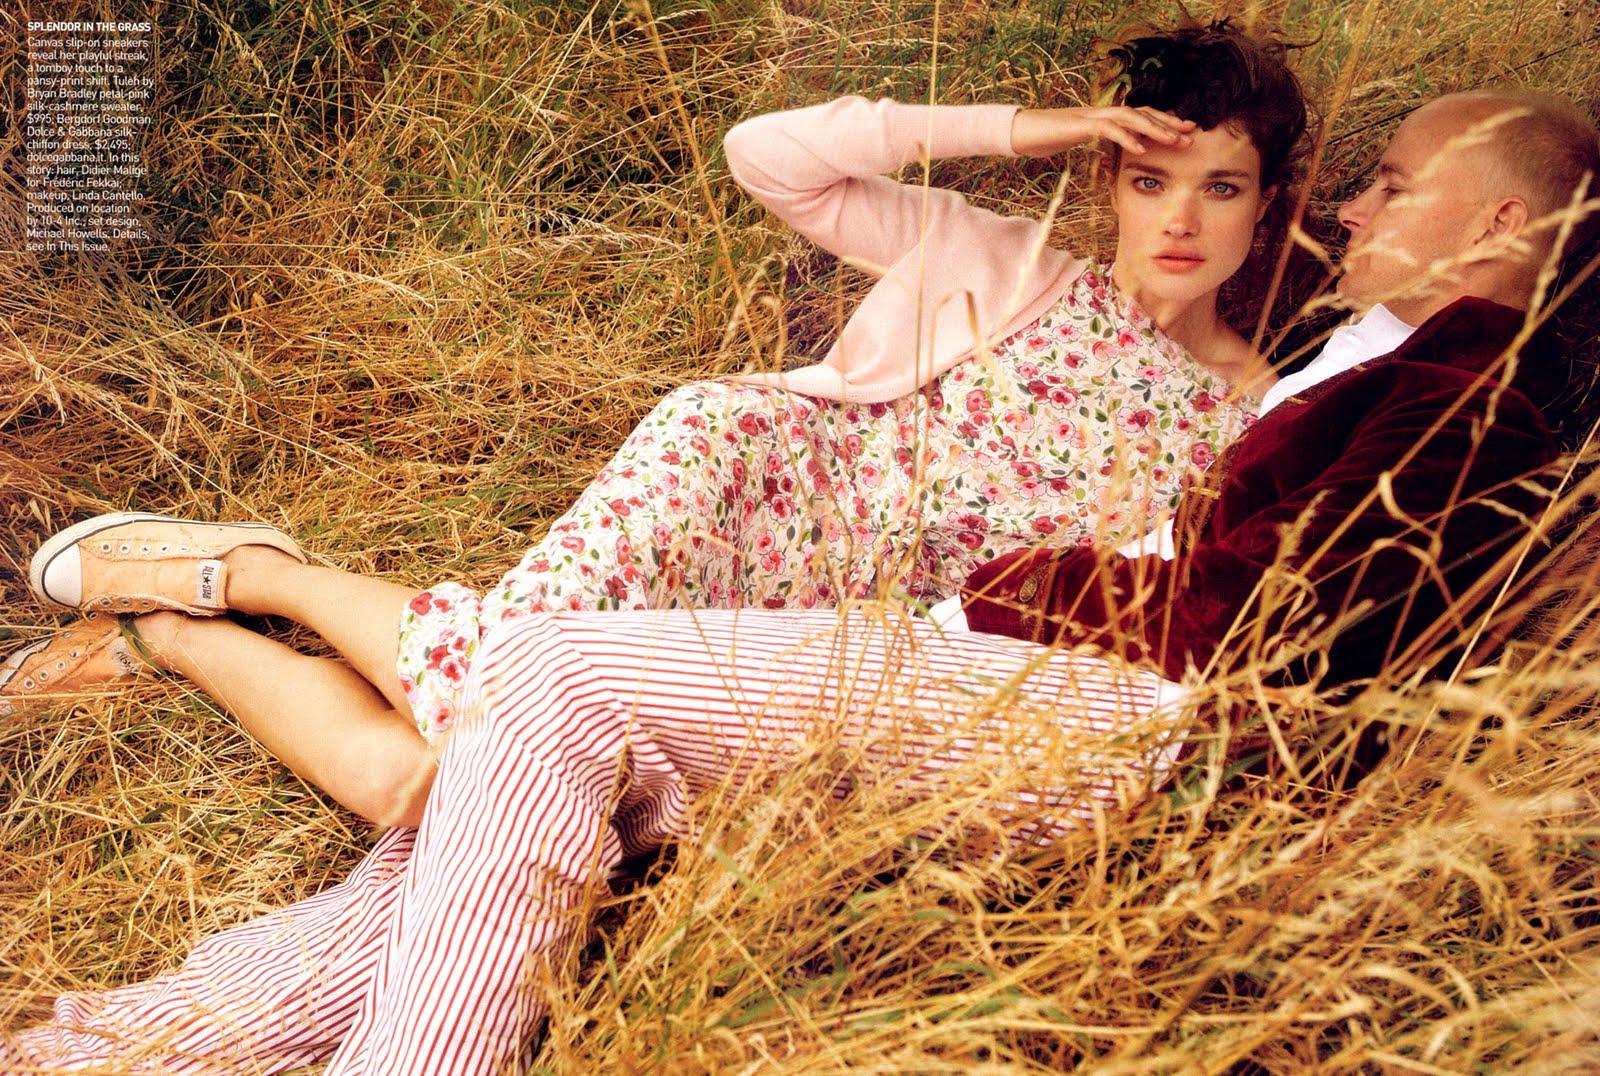 Natalia Vodianova in Vogue US November 2008 (photography: Mario Testino, styling: Grace Coddington)